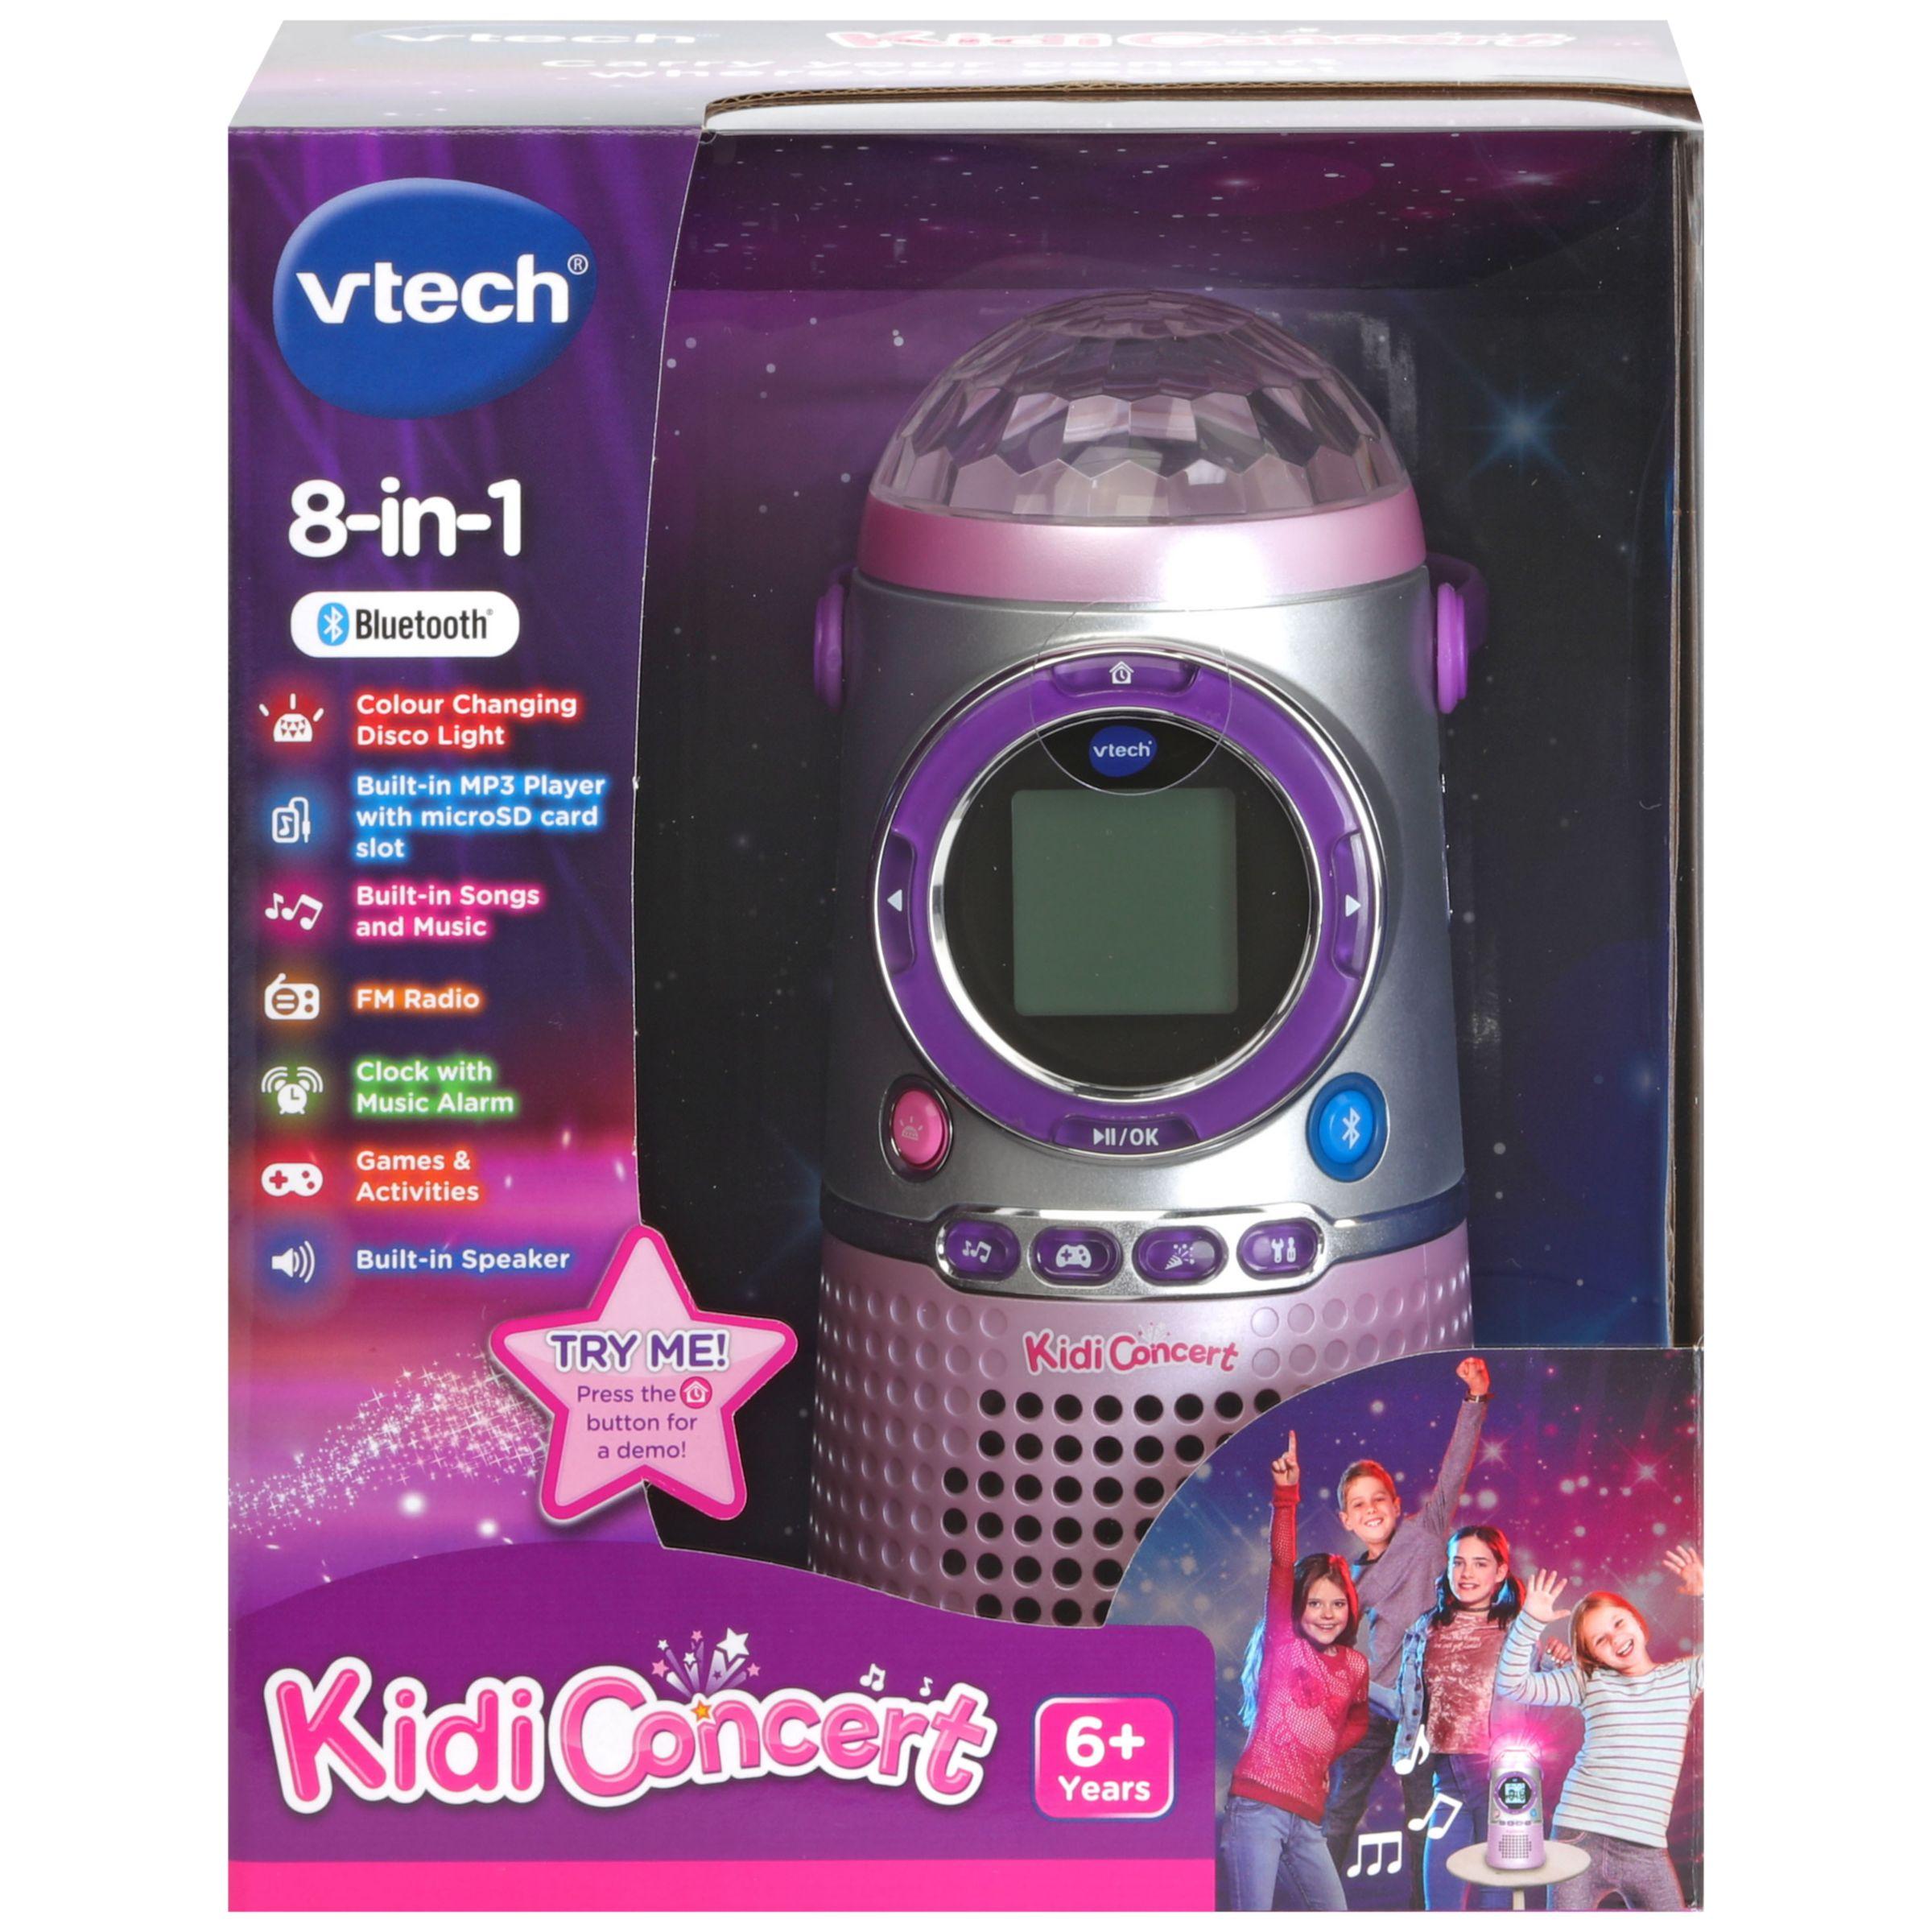 Vtech VTech 8-in-1 Kidi Concert, Pink